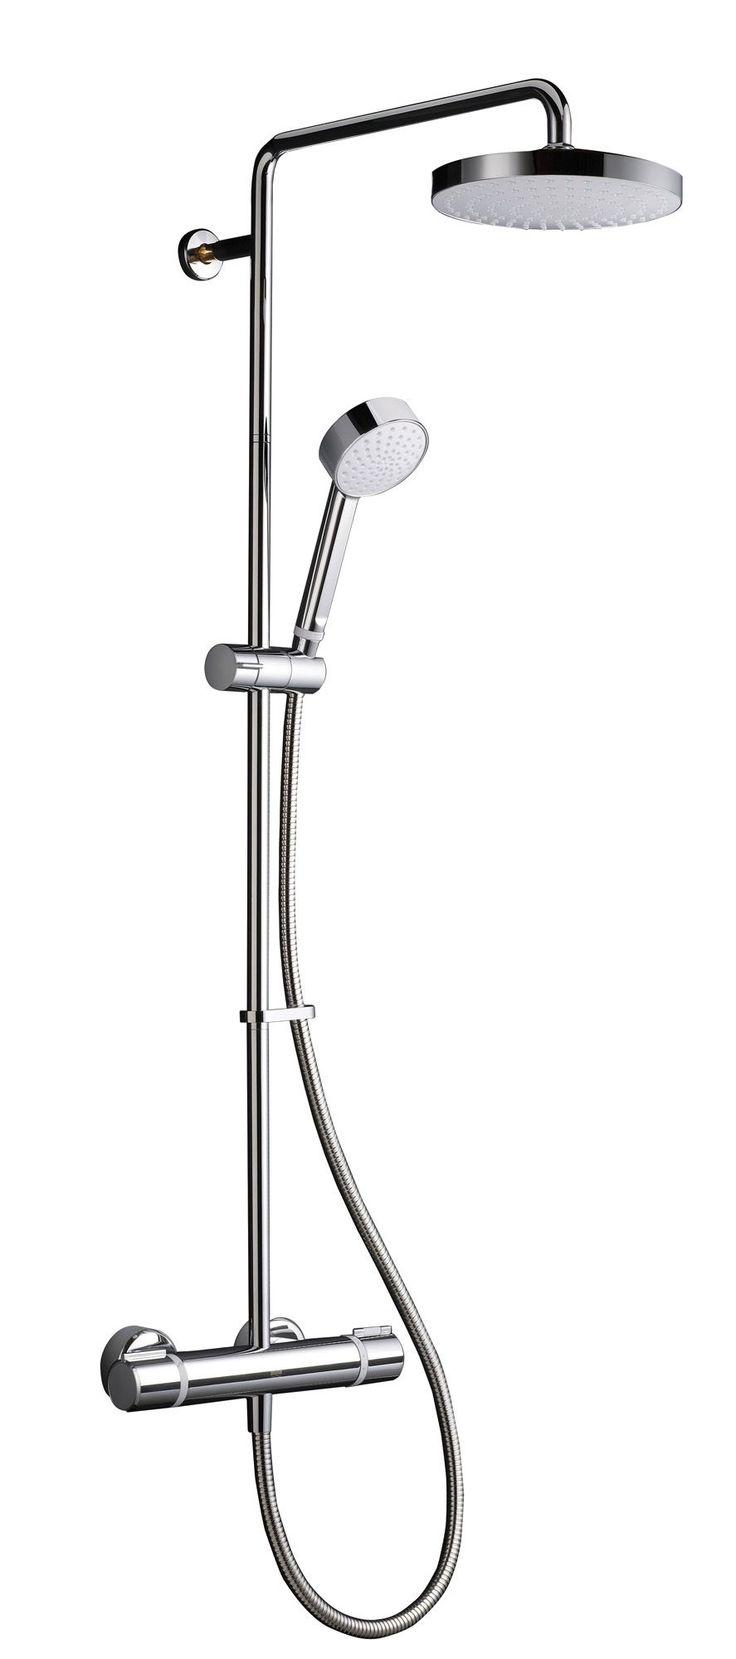 Comfortable Deep Tub Small Bathroom Tall Bathroom Modern Ideas Photos Square Replace Bathroom Fan Light Bulb Bath And Shower Enclosures Old Kitchen And Bathroom Edmonton ColouredLowes Bathroom Vanity Tops 1000  Images About Bathroom On Pinterest | Heated Towel Rail ..